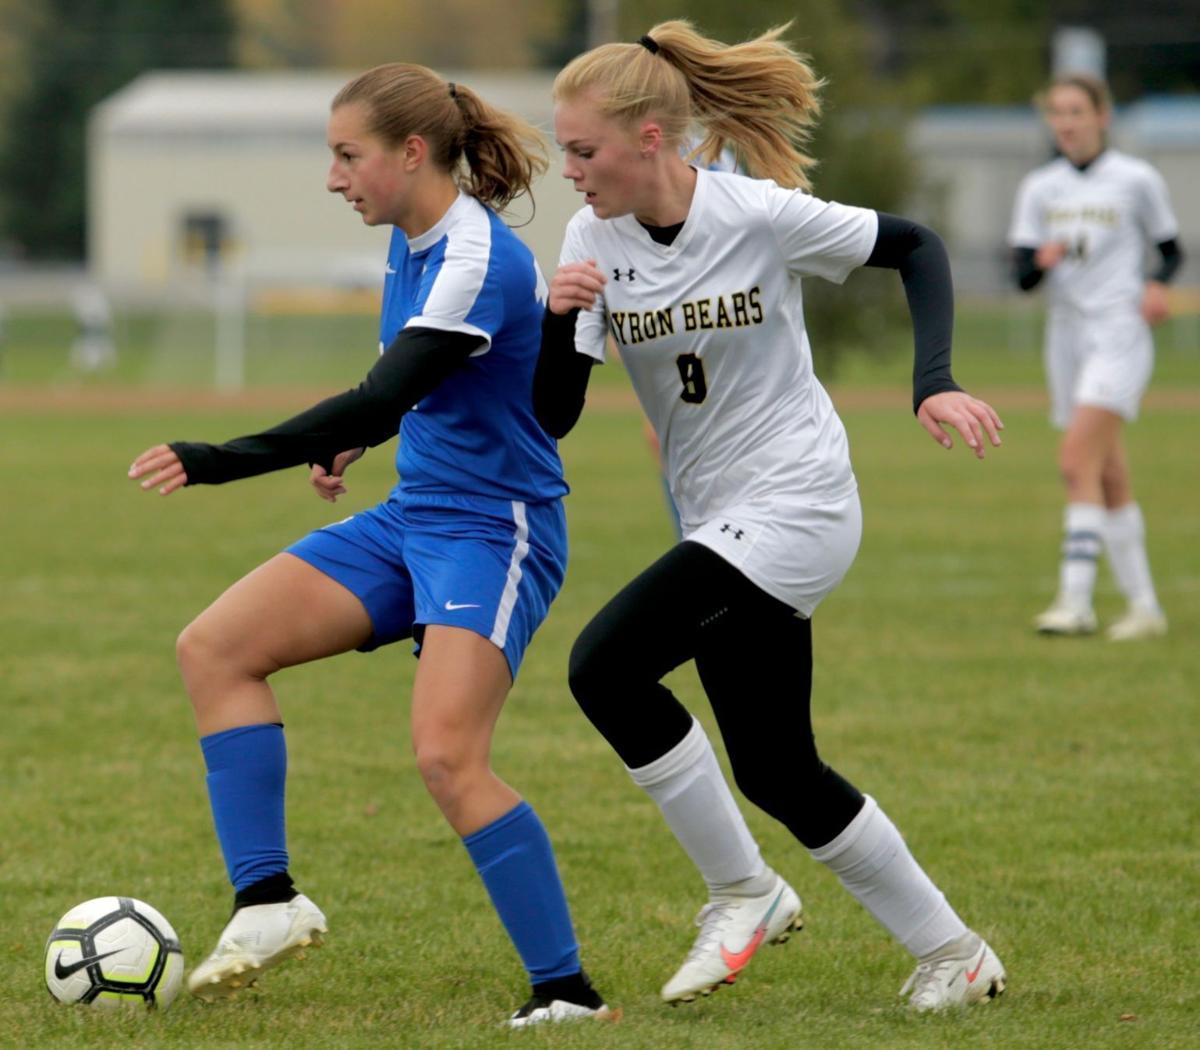 Photos: Cotter girls soccer vs Byron